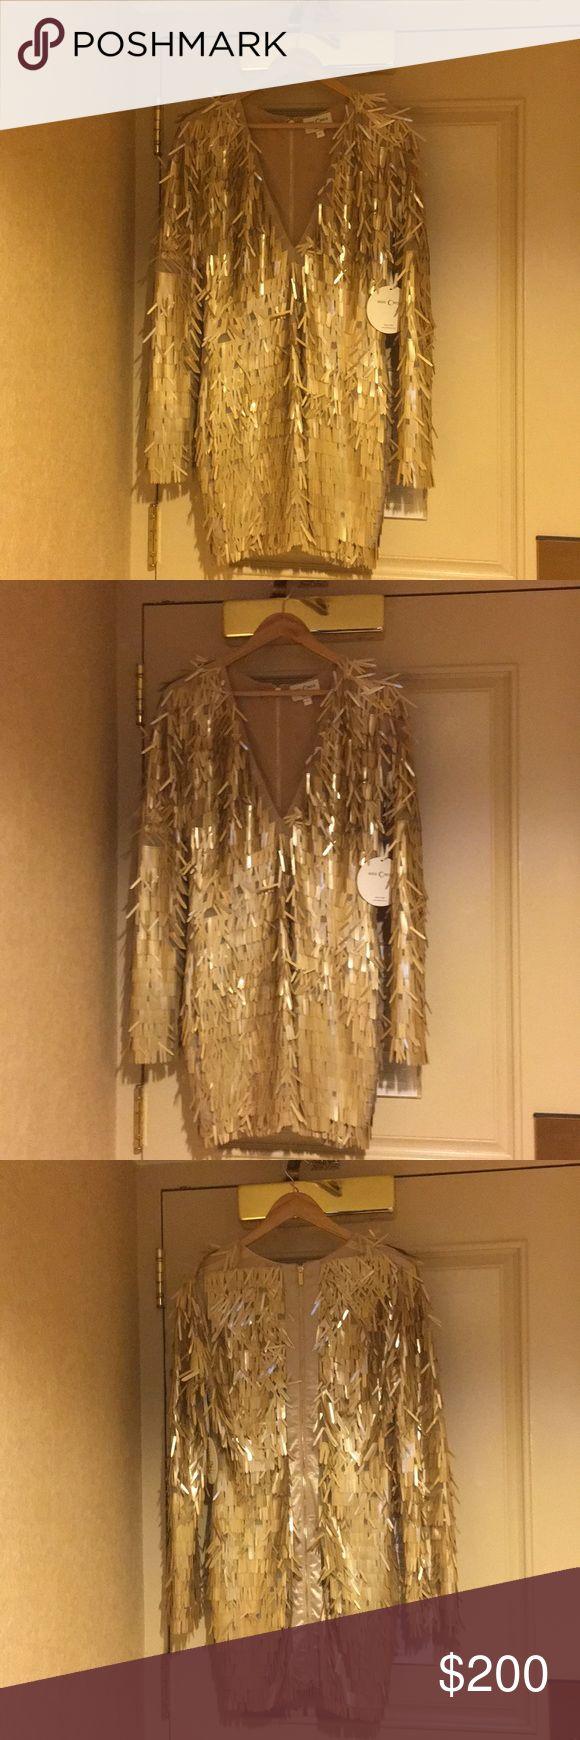 NEW Gold metallic sequin dress Never worn Mini gold sequin dress Dresses Mini